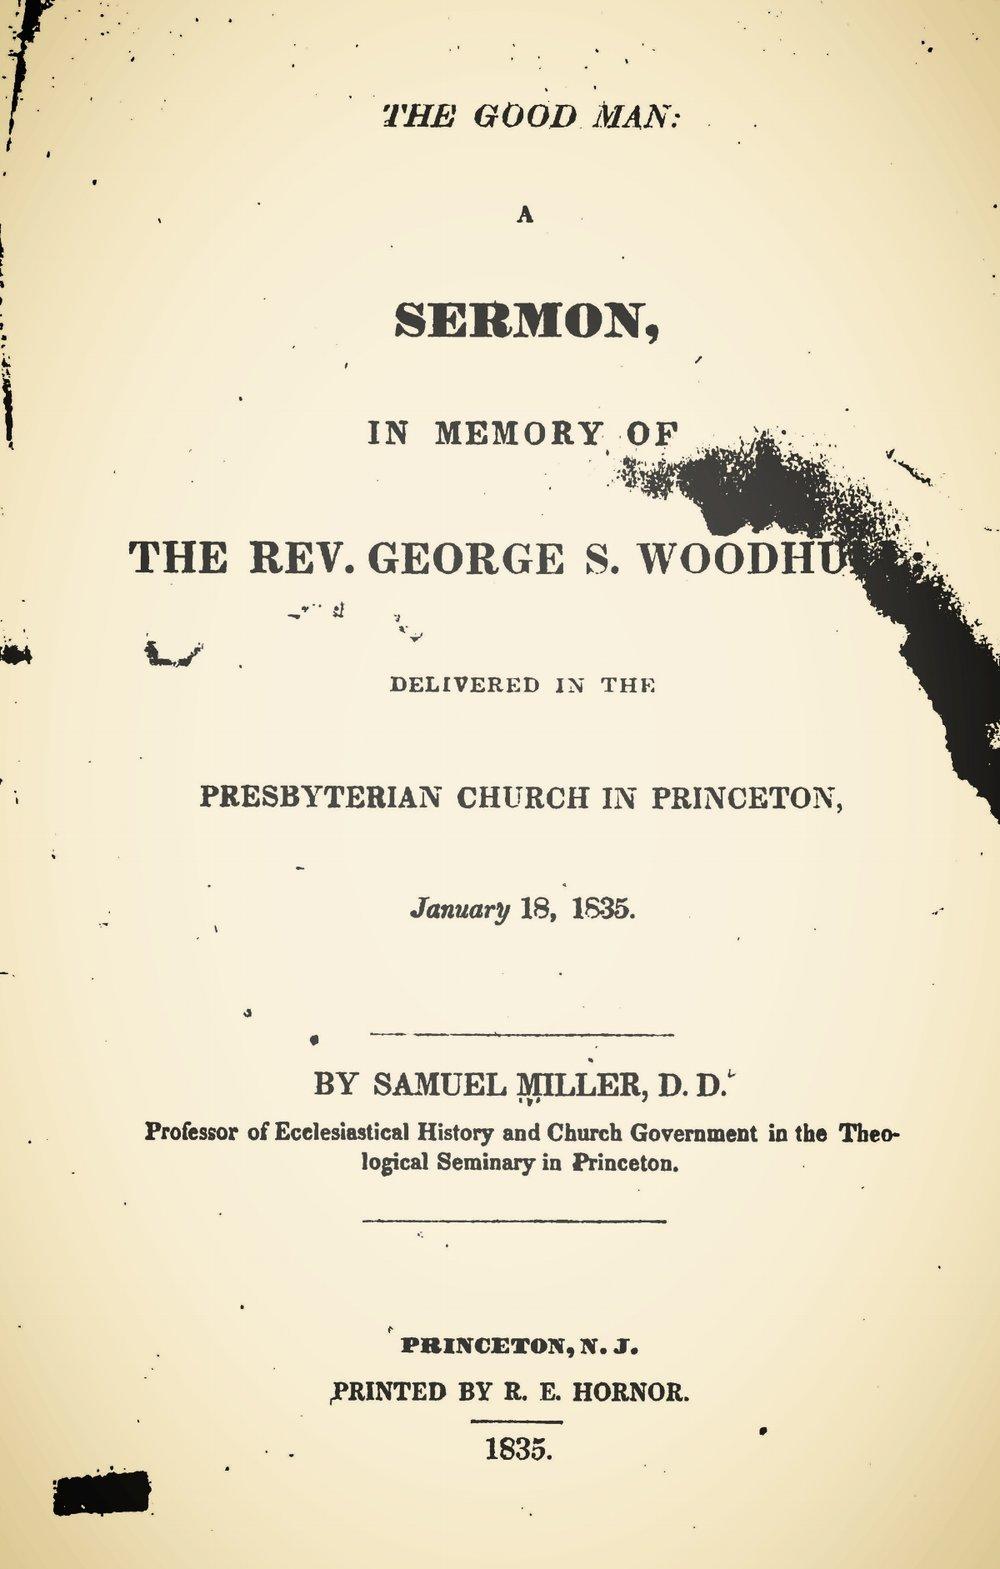 Miller, Samuel, The Good Man Title Page.jpg